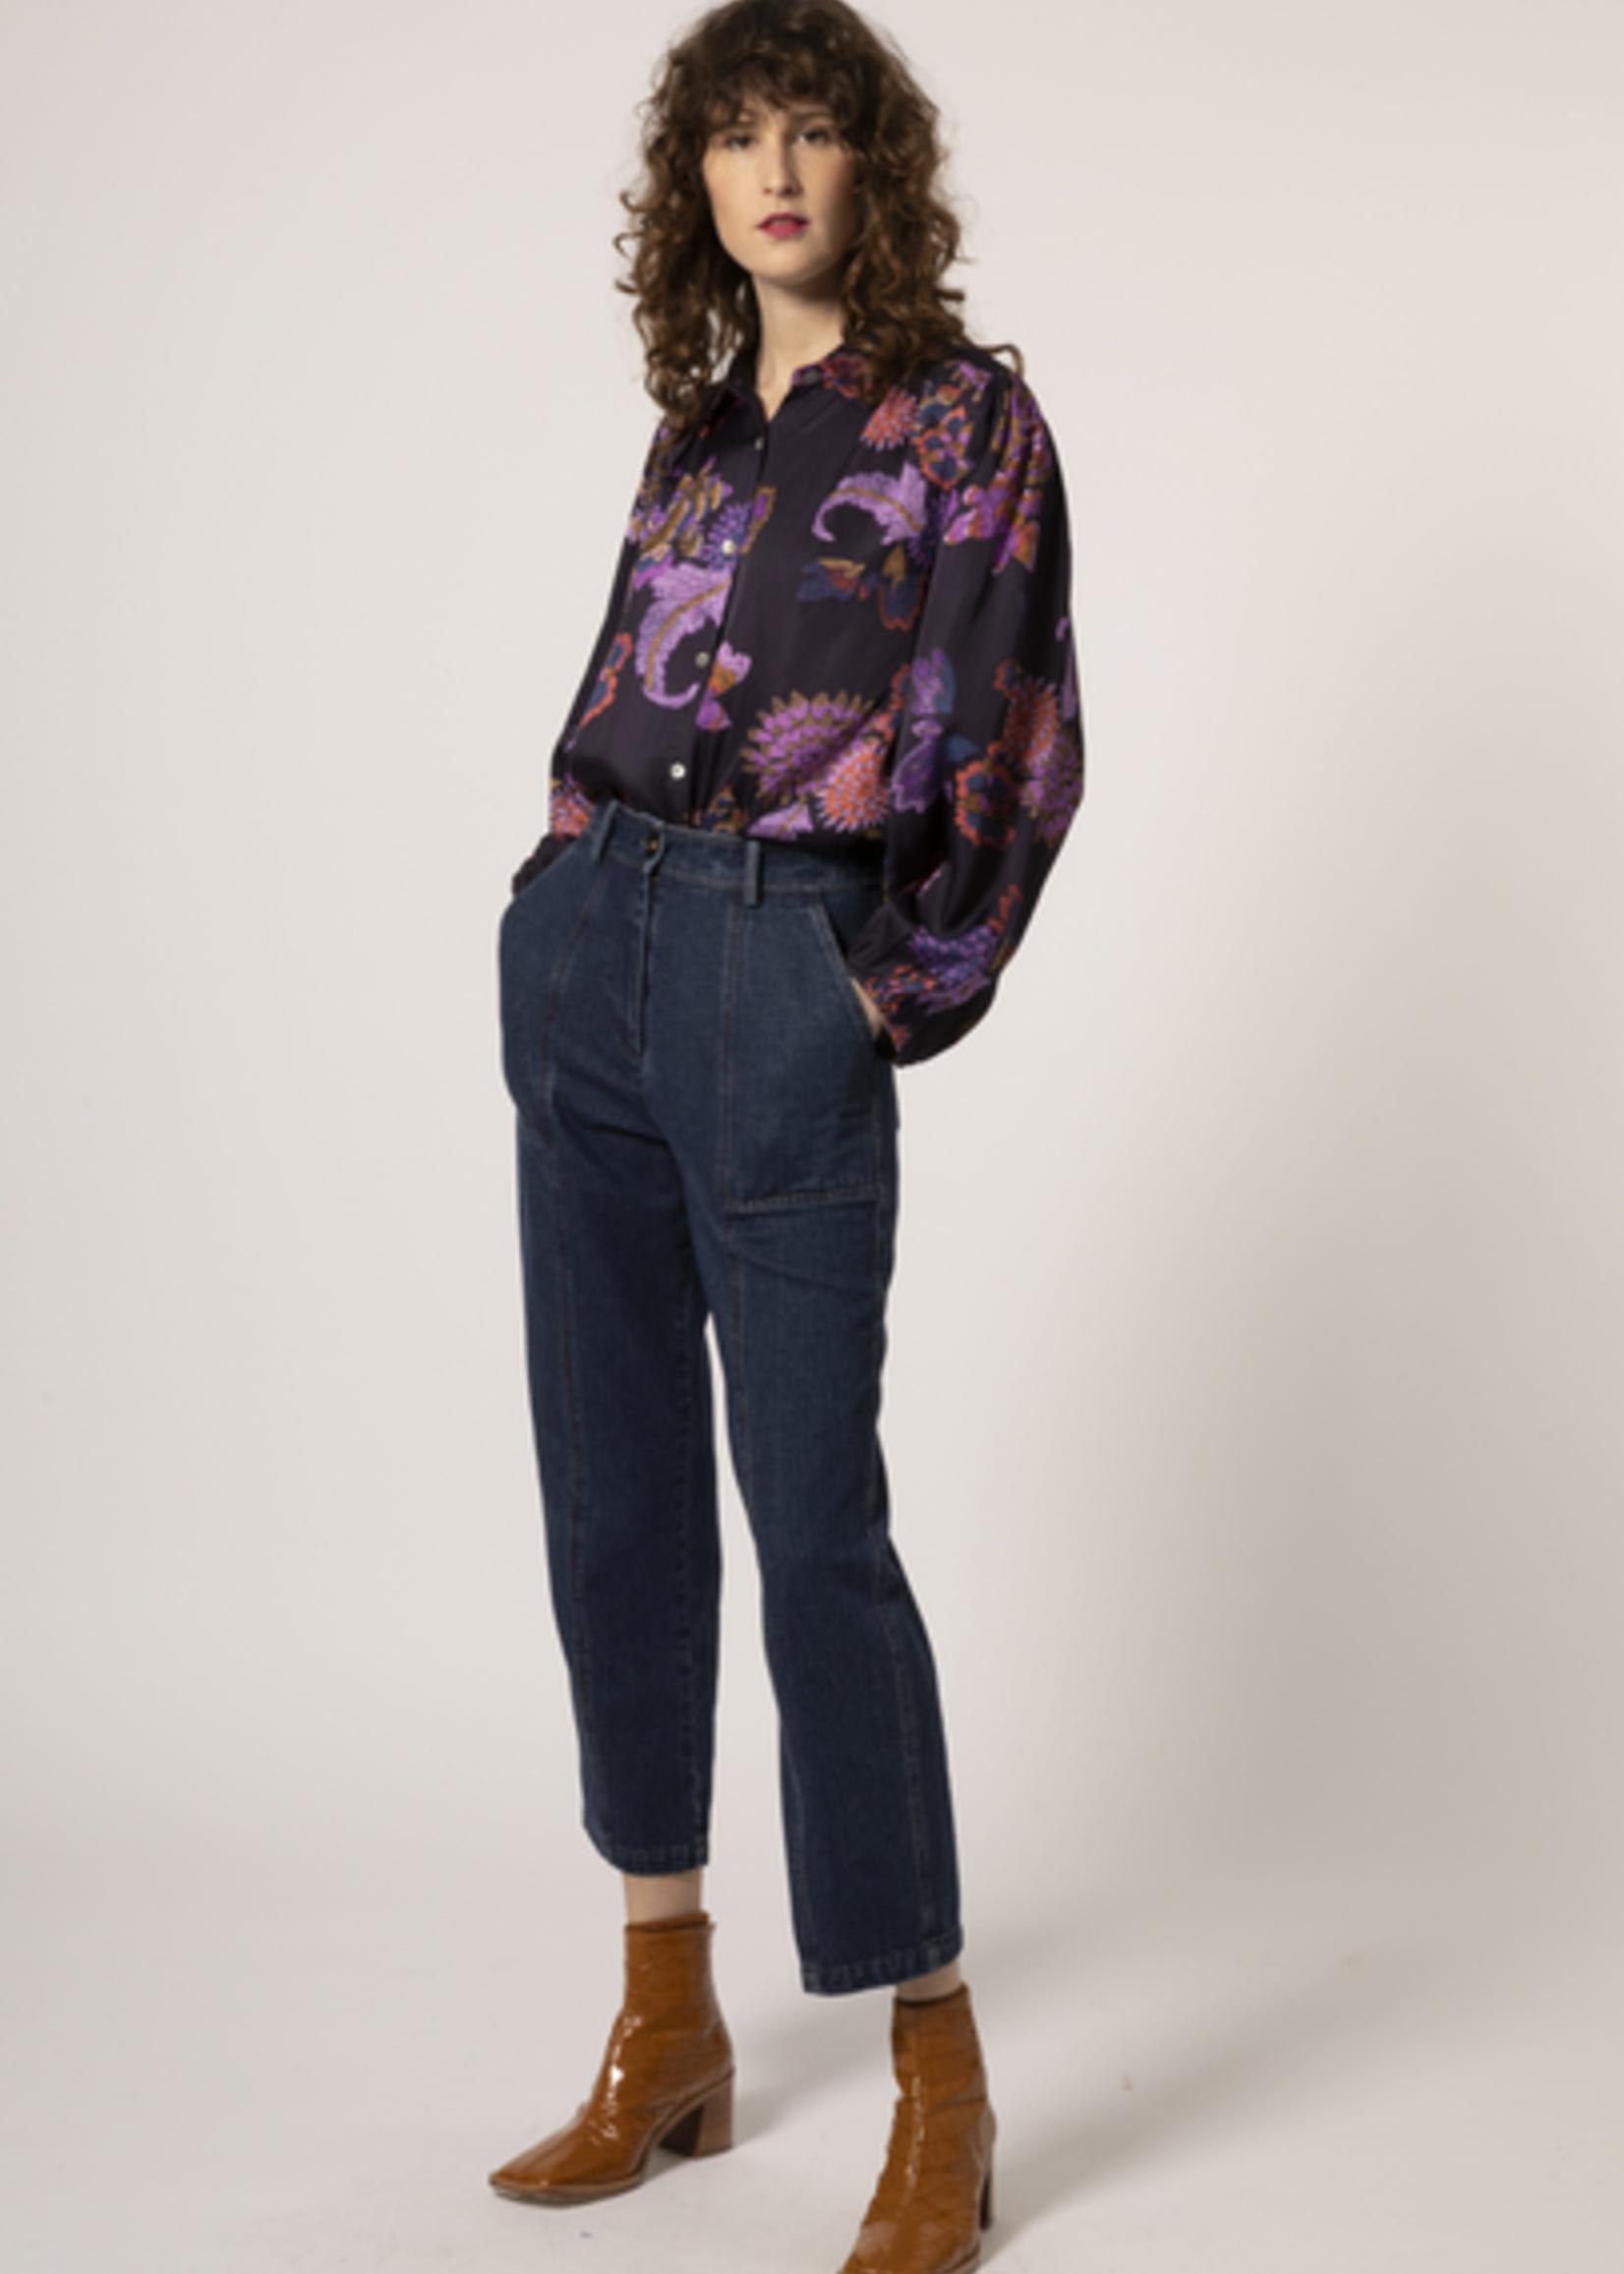 Elitaire Boutique Camassia Shirt in Retro Floral